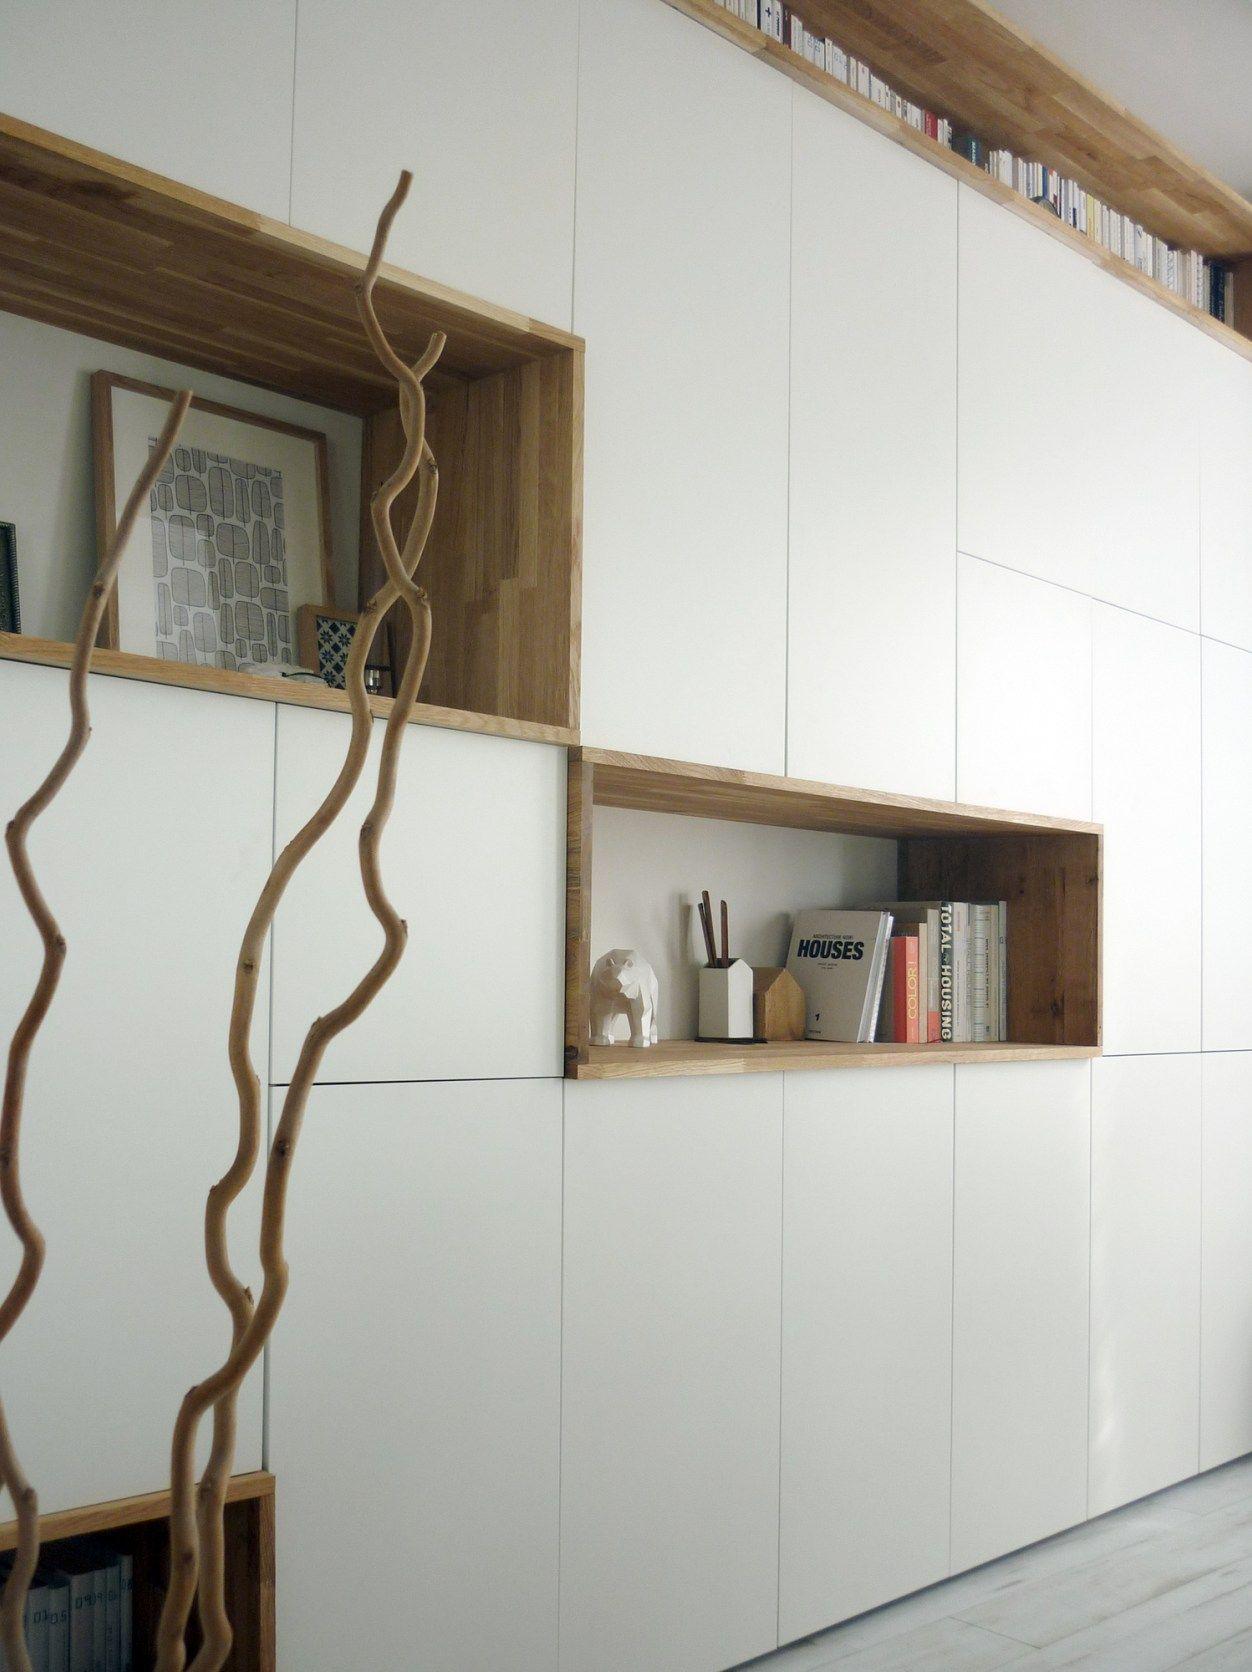 Mur Rangements Blanc Bois Scandinave Pinteres  # Meubles Bas Bibliotheque Salon